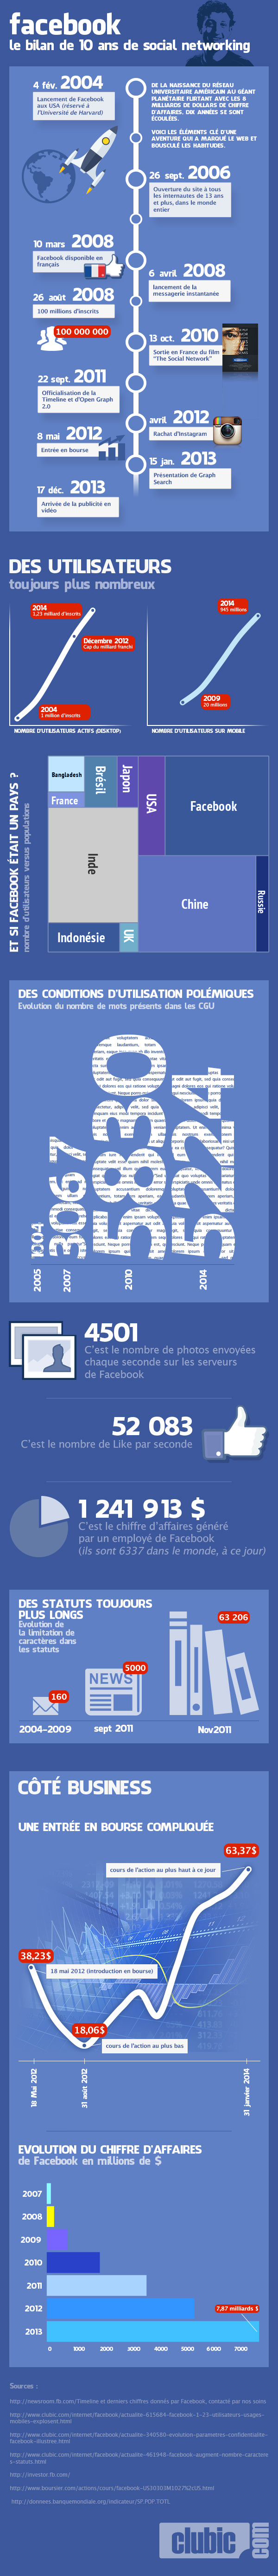 Facebook-10ans